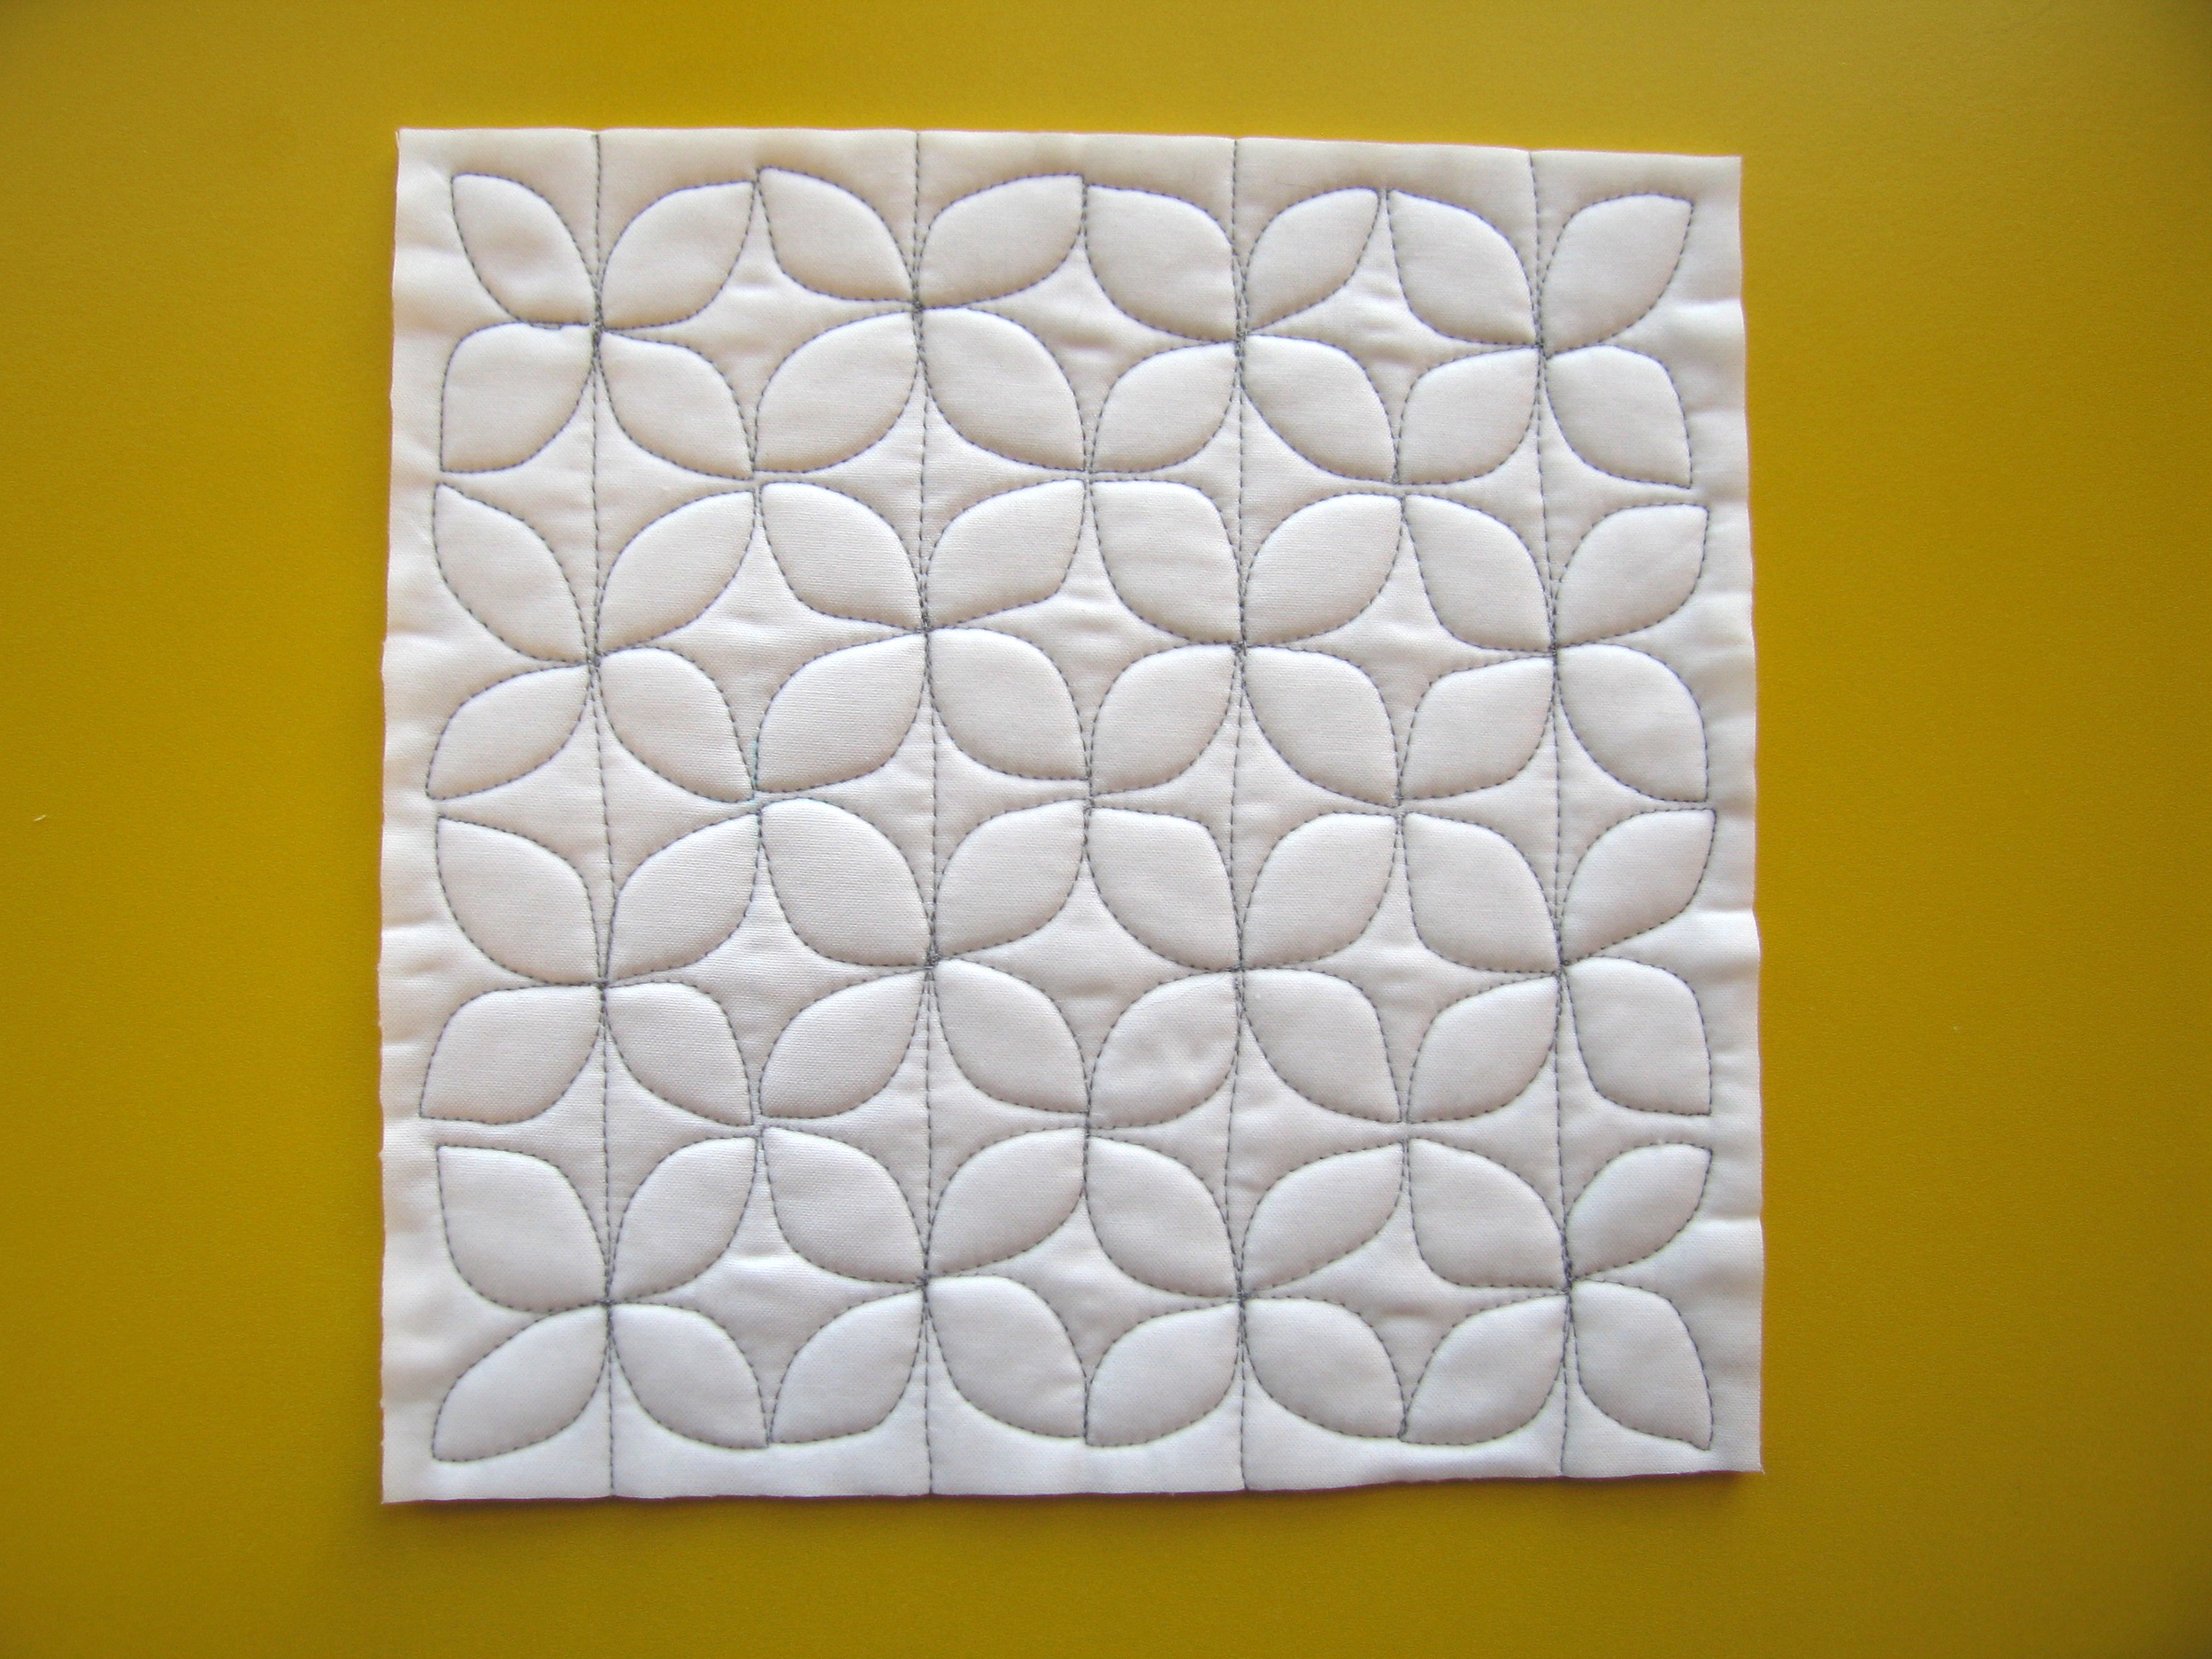 Dogwood quilting by Elizabeth Hartman. ohfransson.com